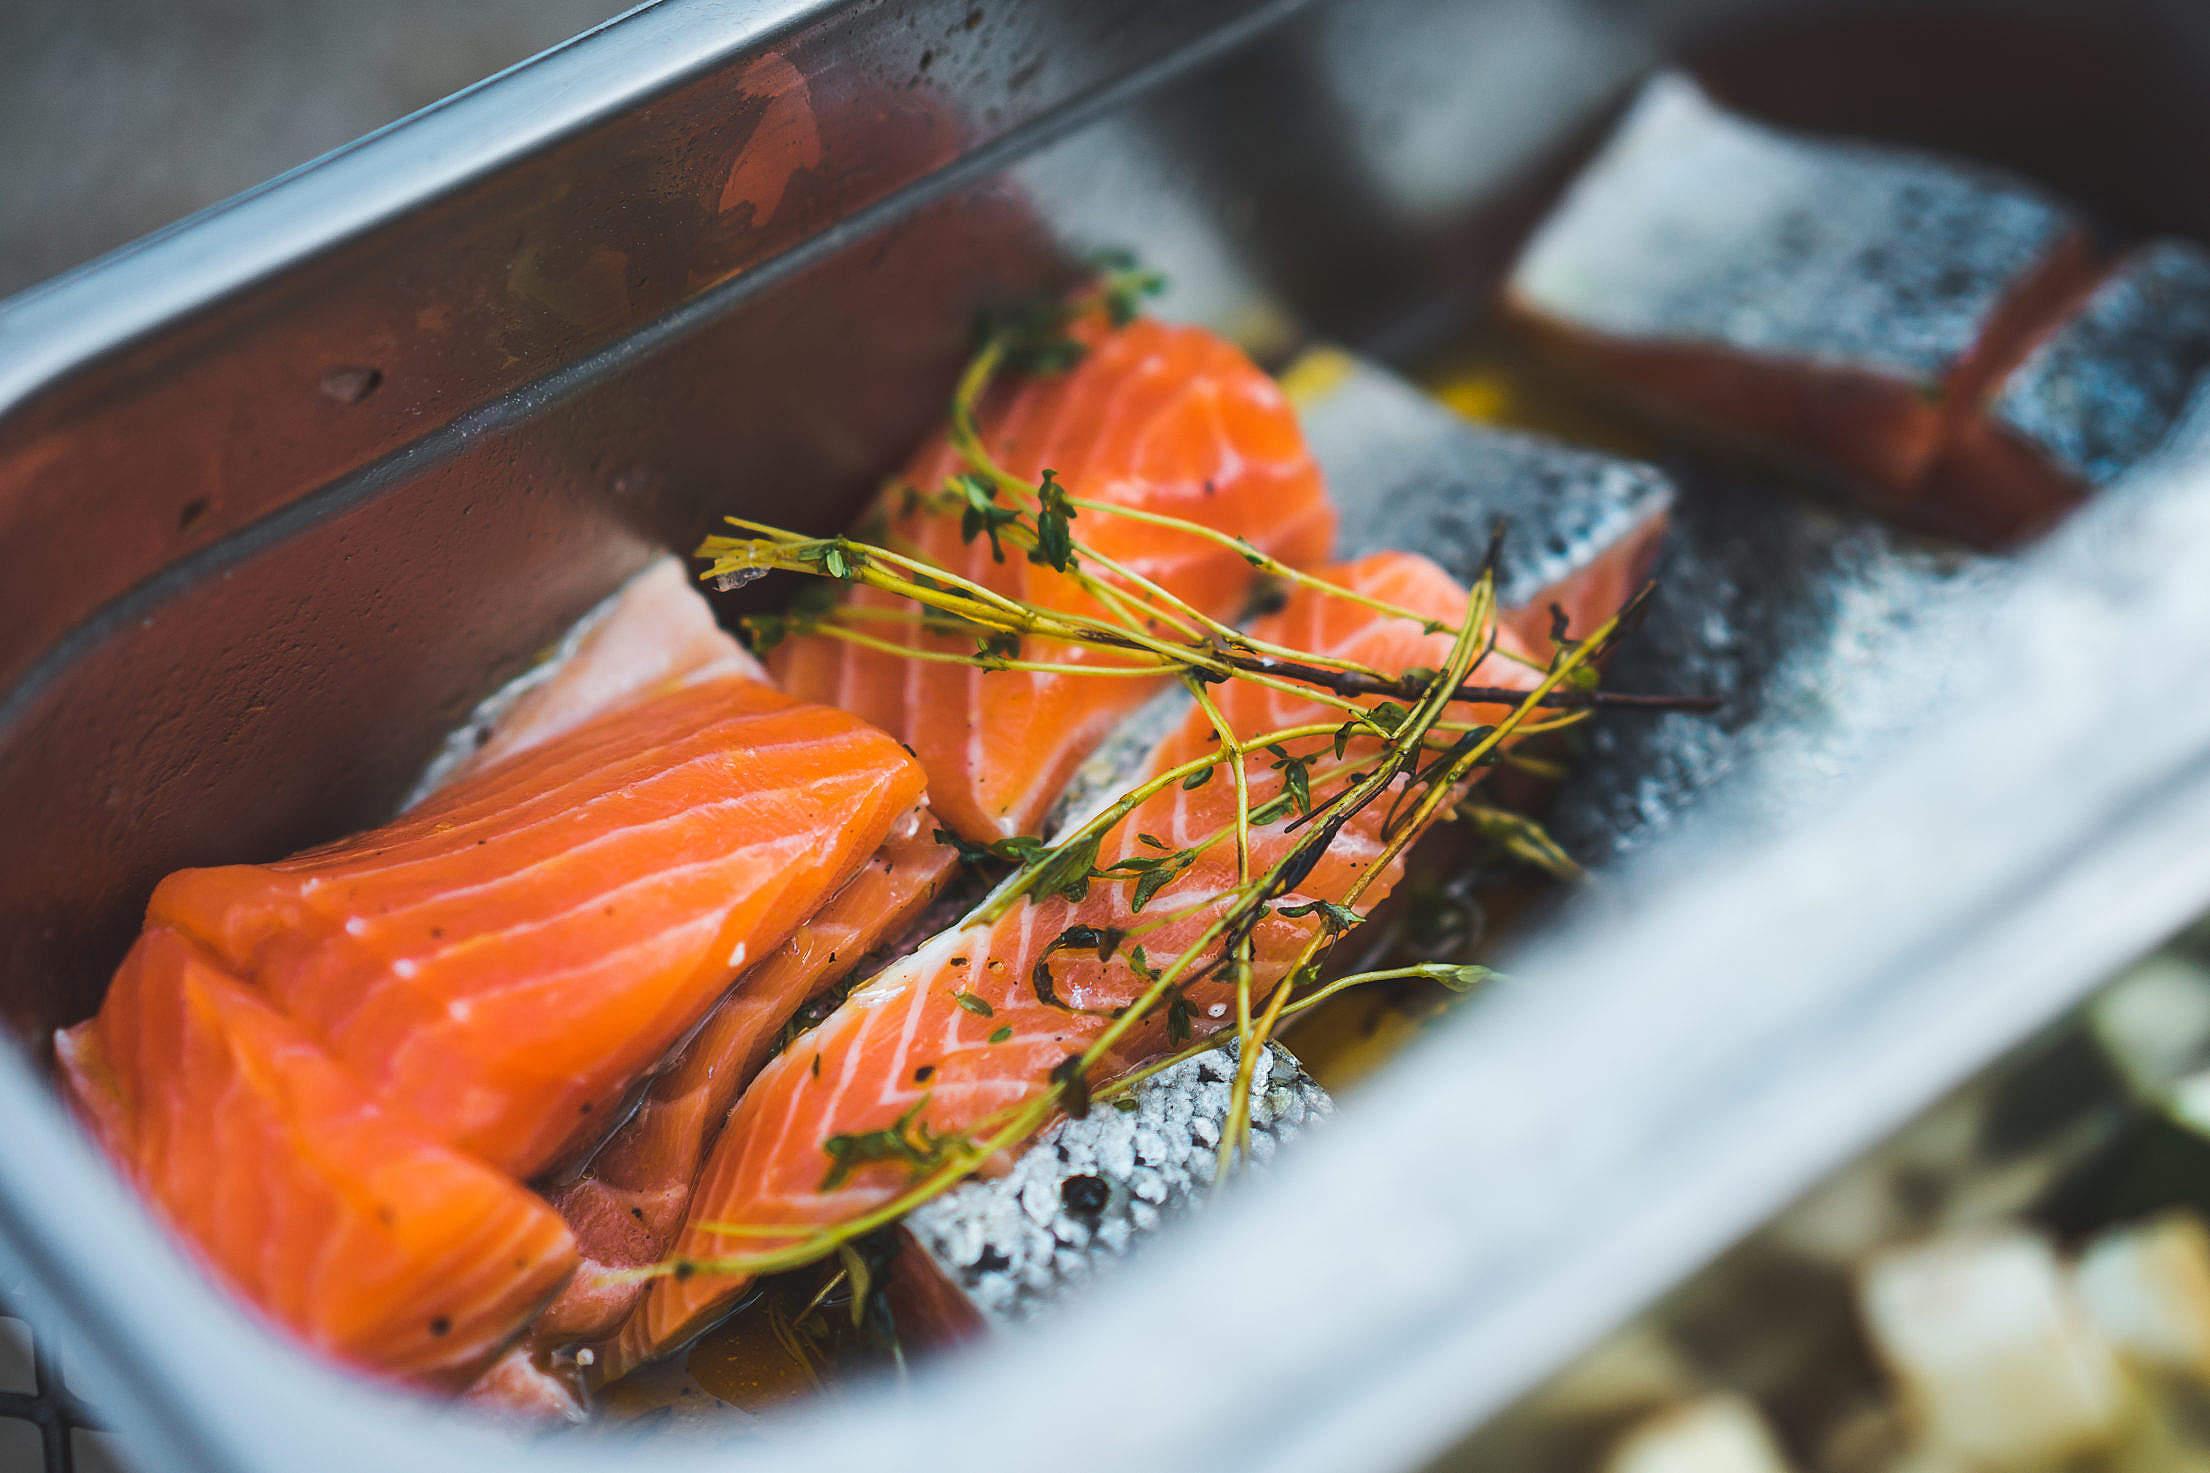 Marinated Salmon Free Stock Photo